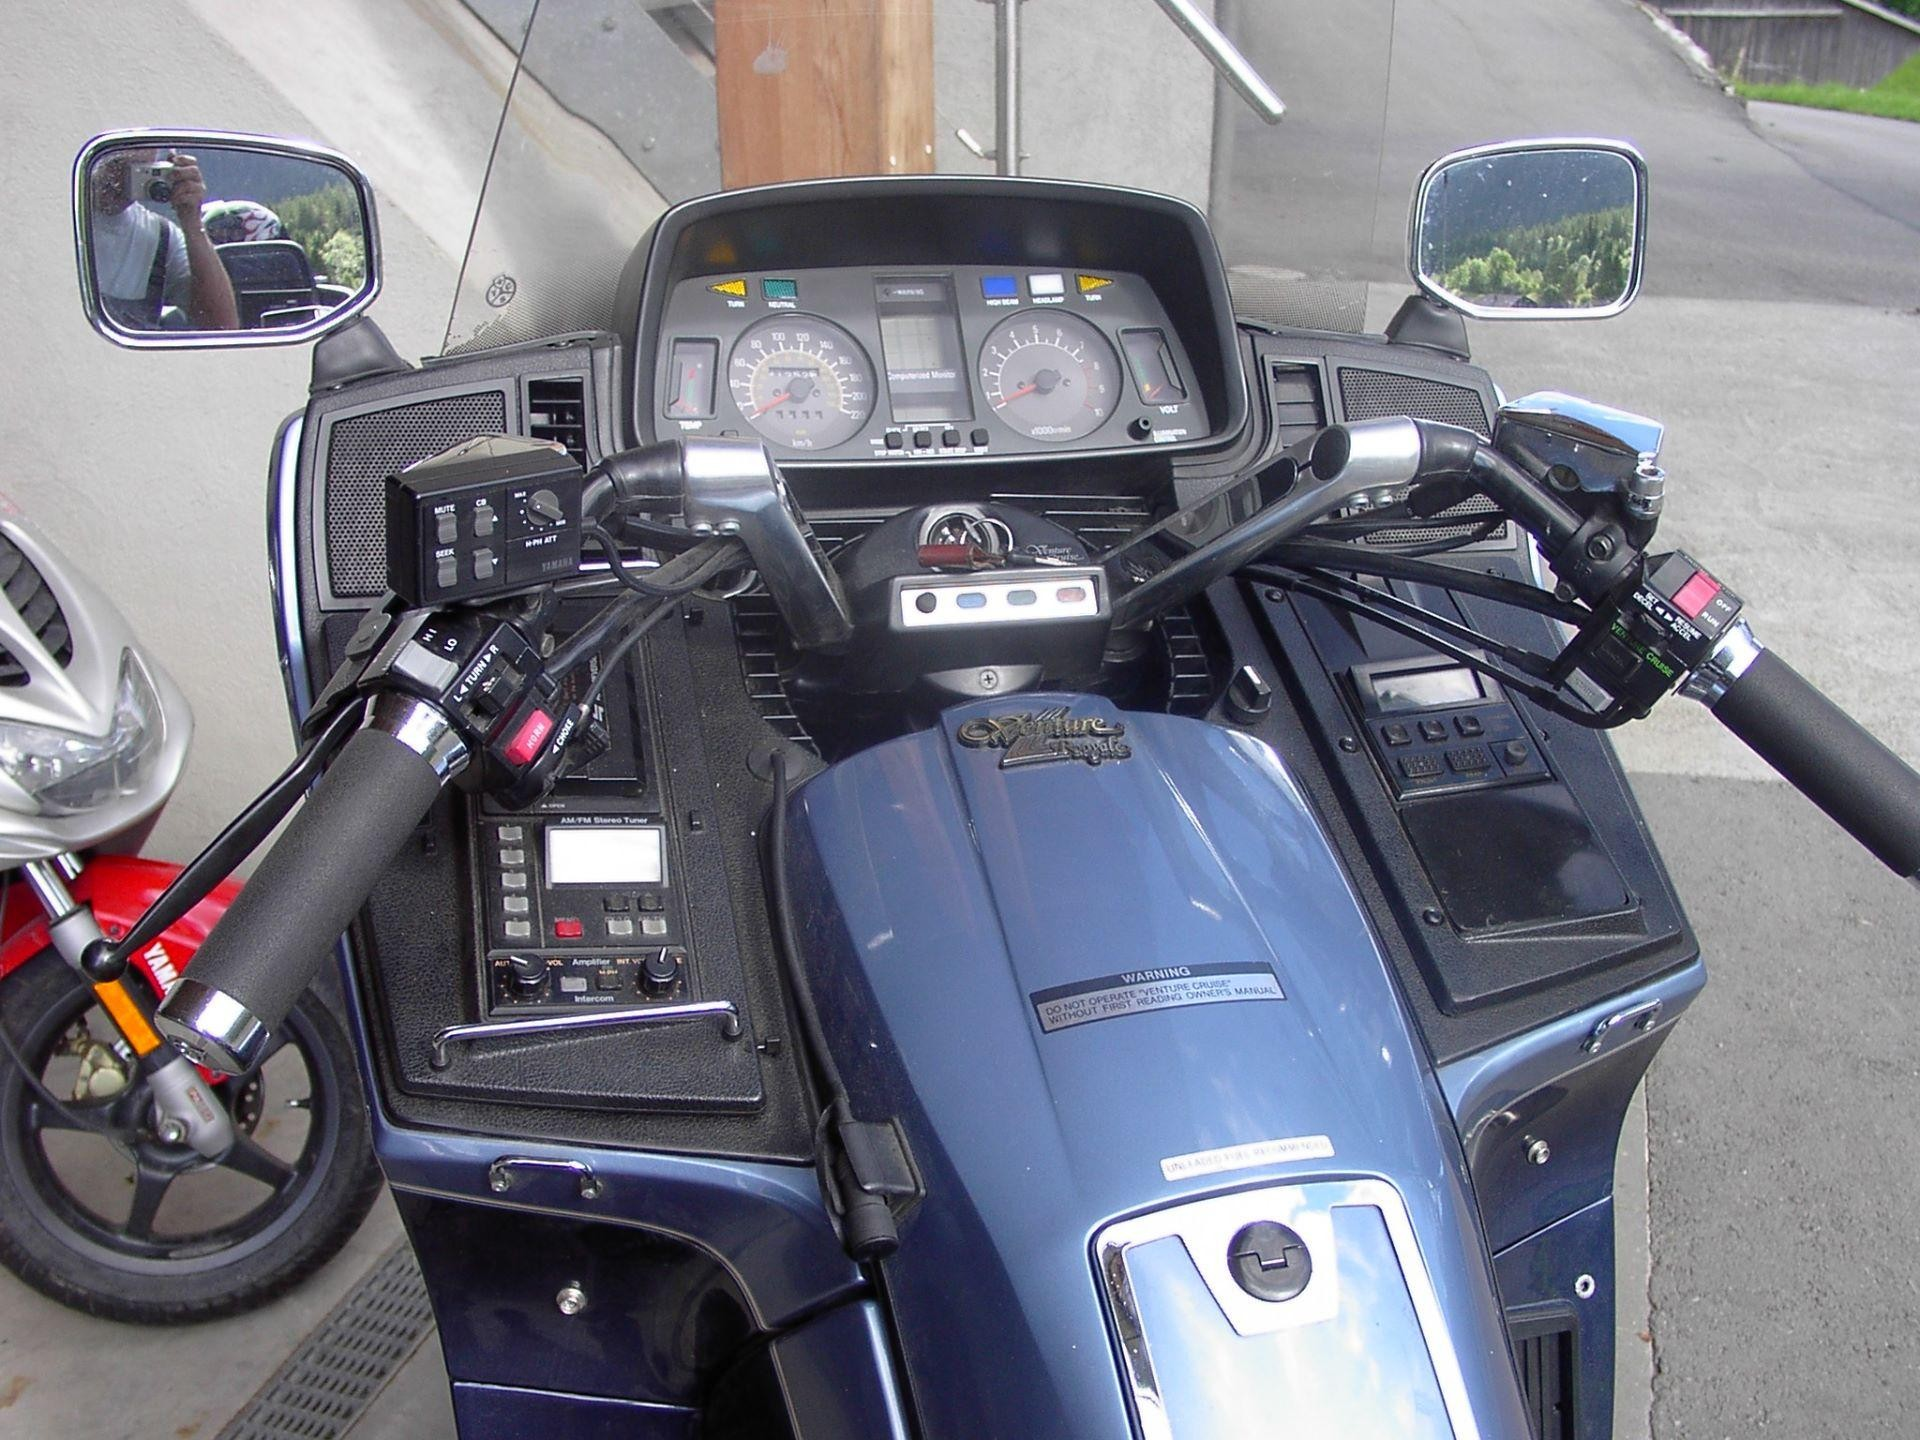 Yamaha Venture Royale